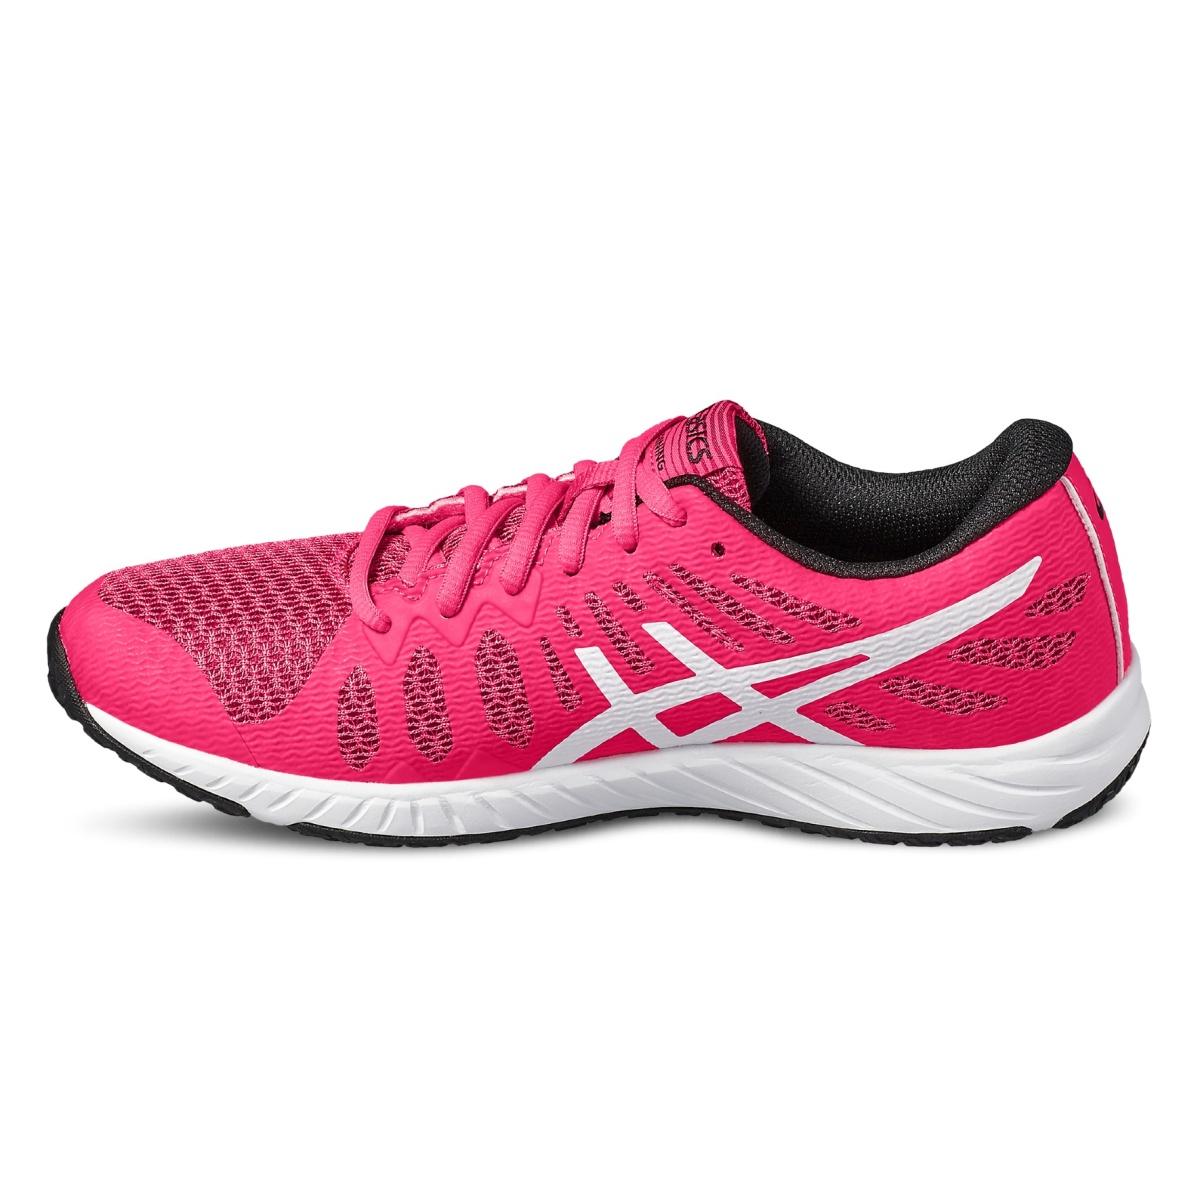 Asics Nitrofuze TR 2017 pink Fitnessschuhe Damen AWKQw